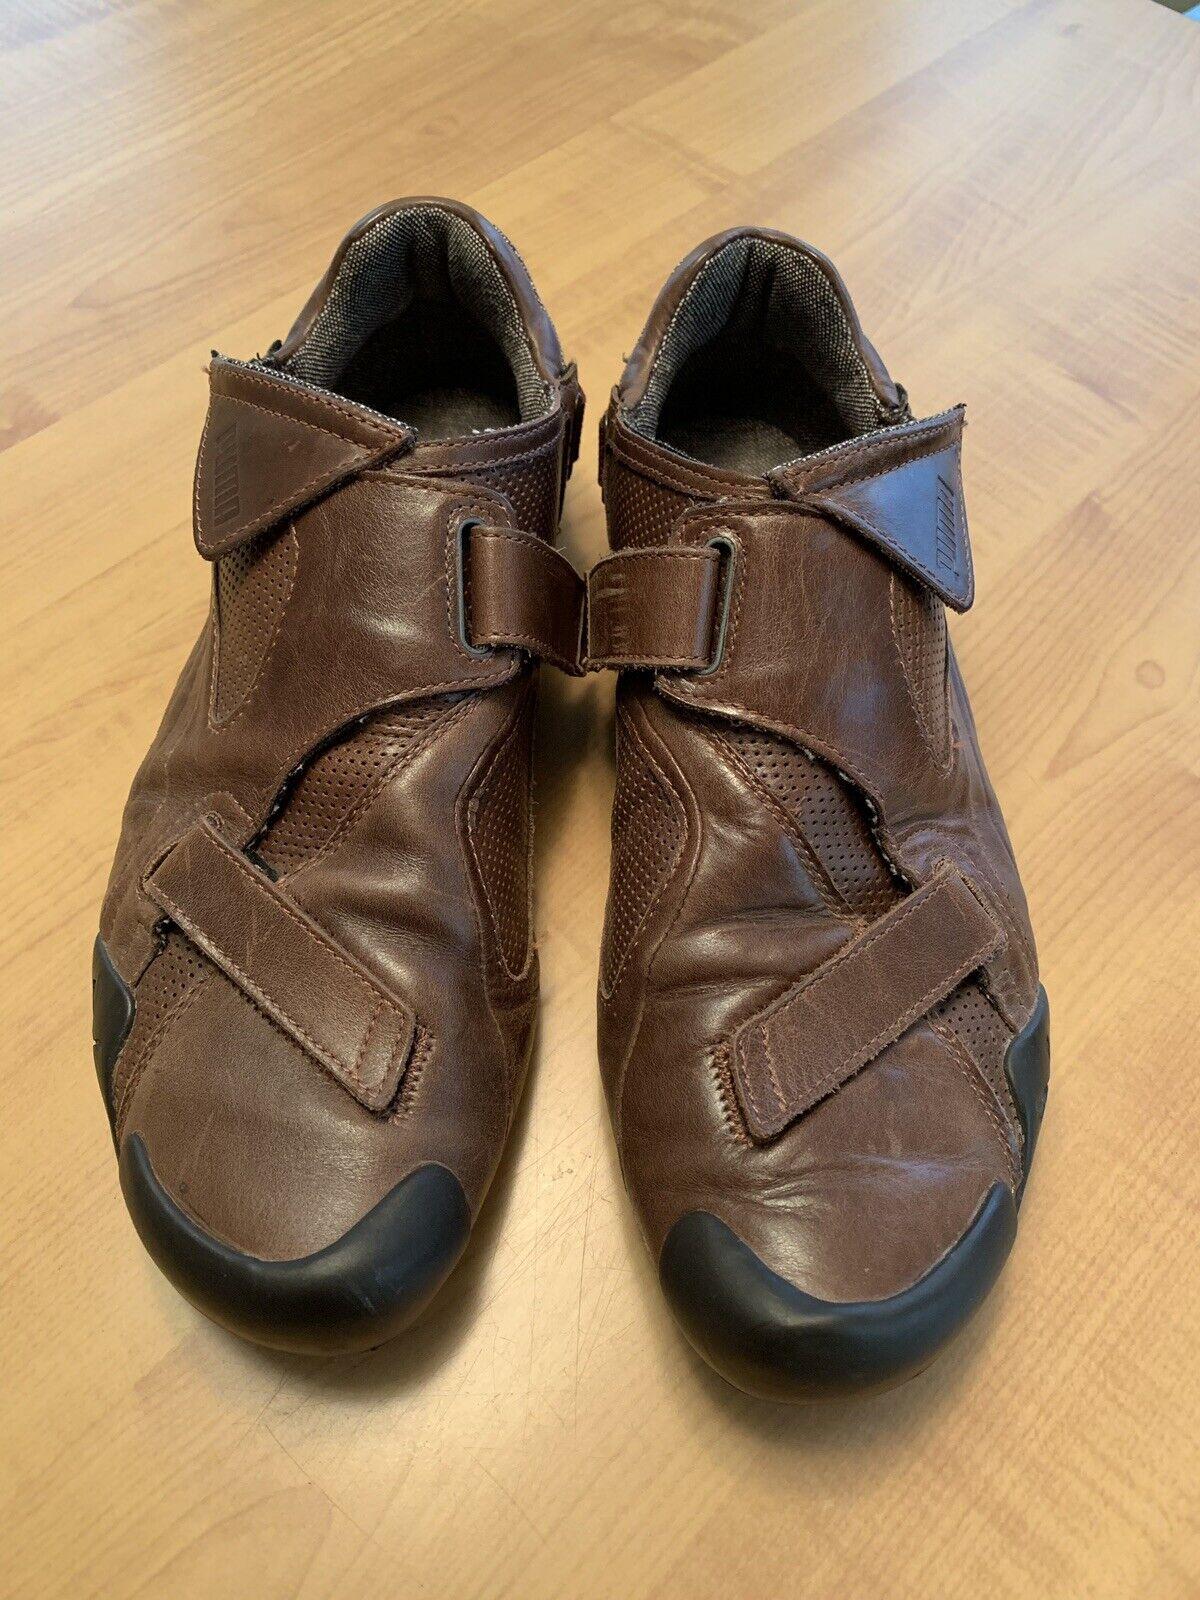 Puma Shanghai Milea Mesh Brown Leather Size 10 US